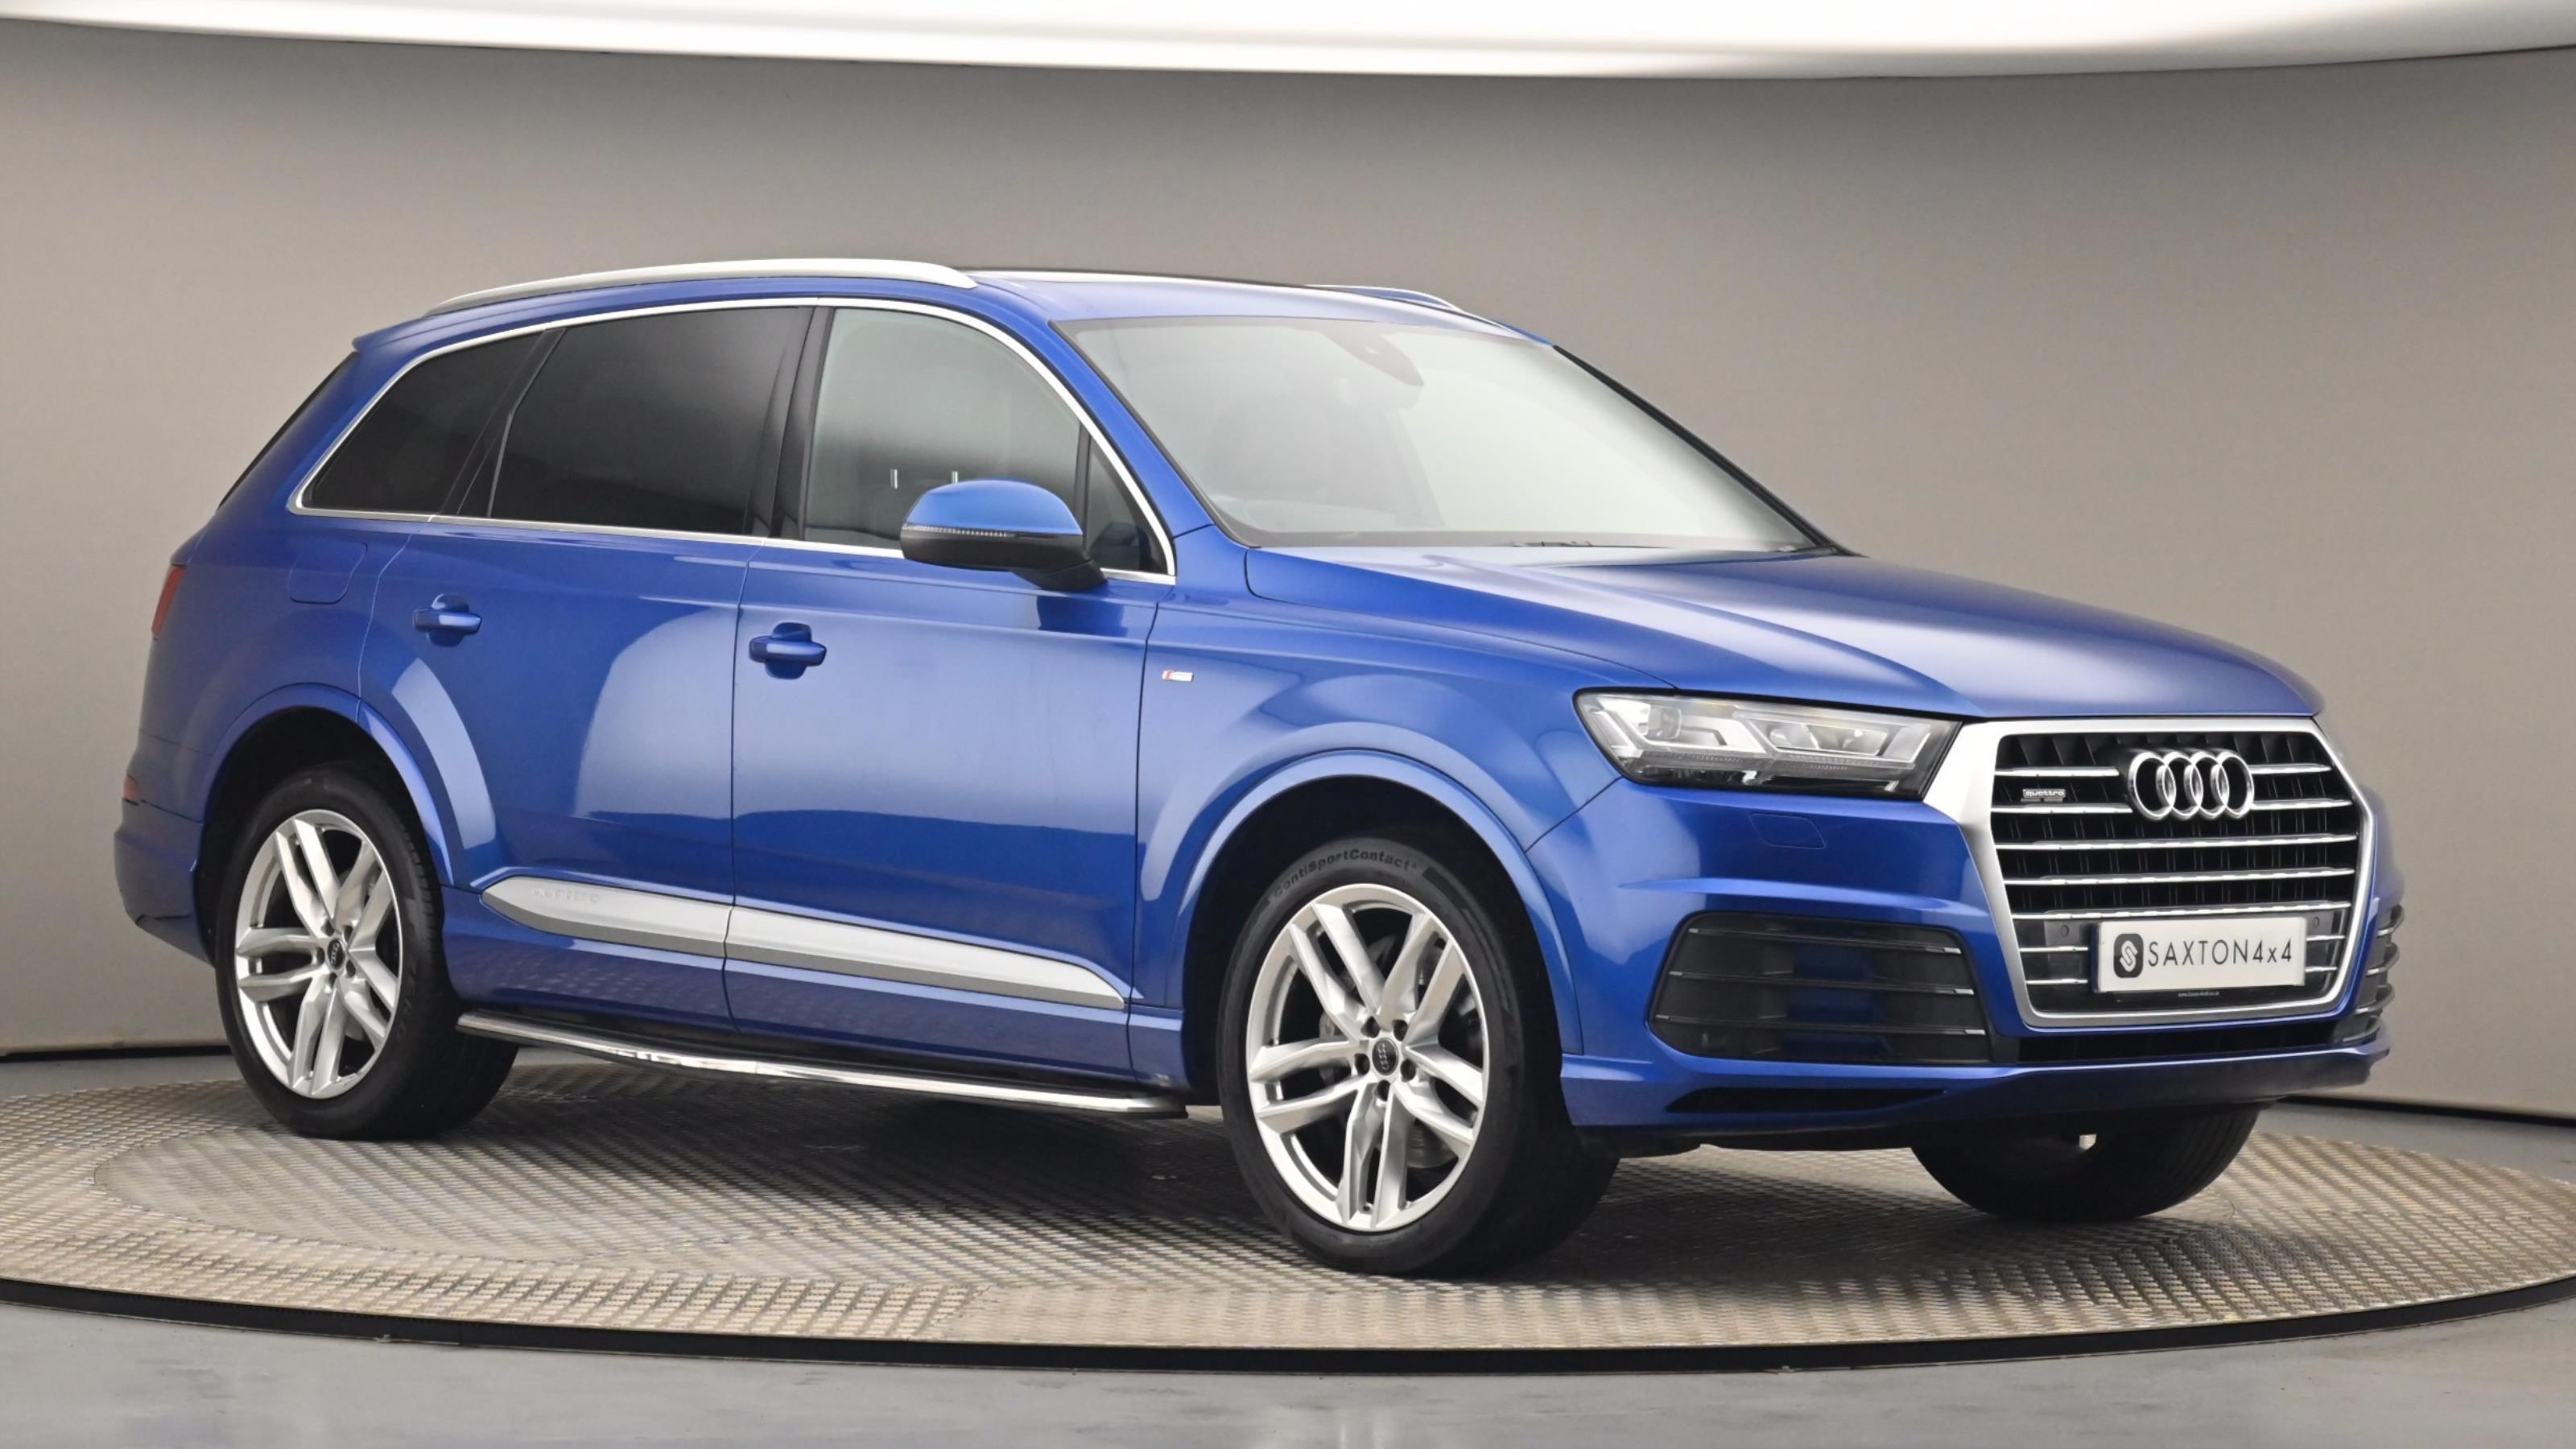 Used 2018 Audi Q7 3.0 TDI Quattro S Line 5dr Tip Auto BLUE at Saxton4x4